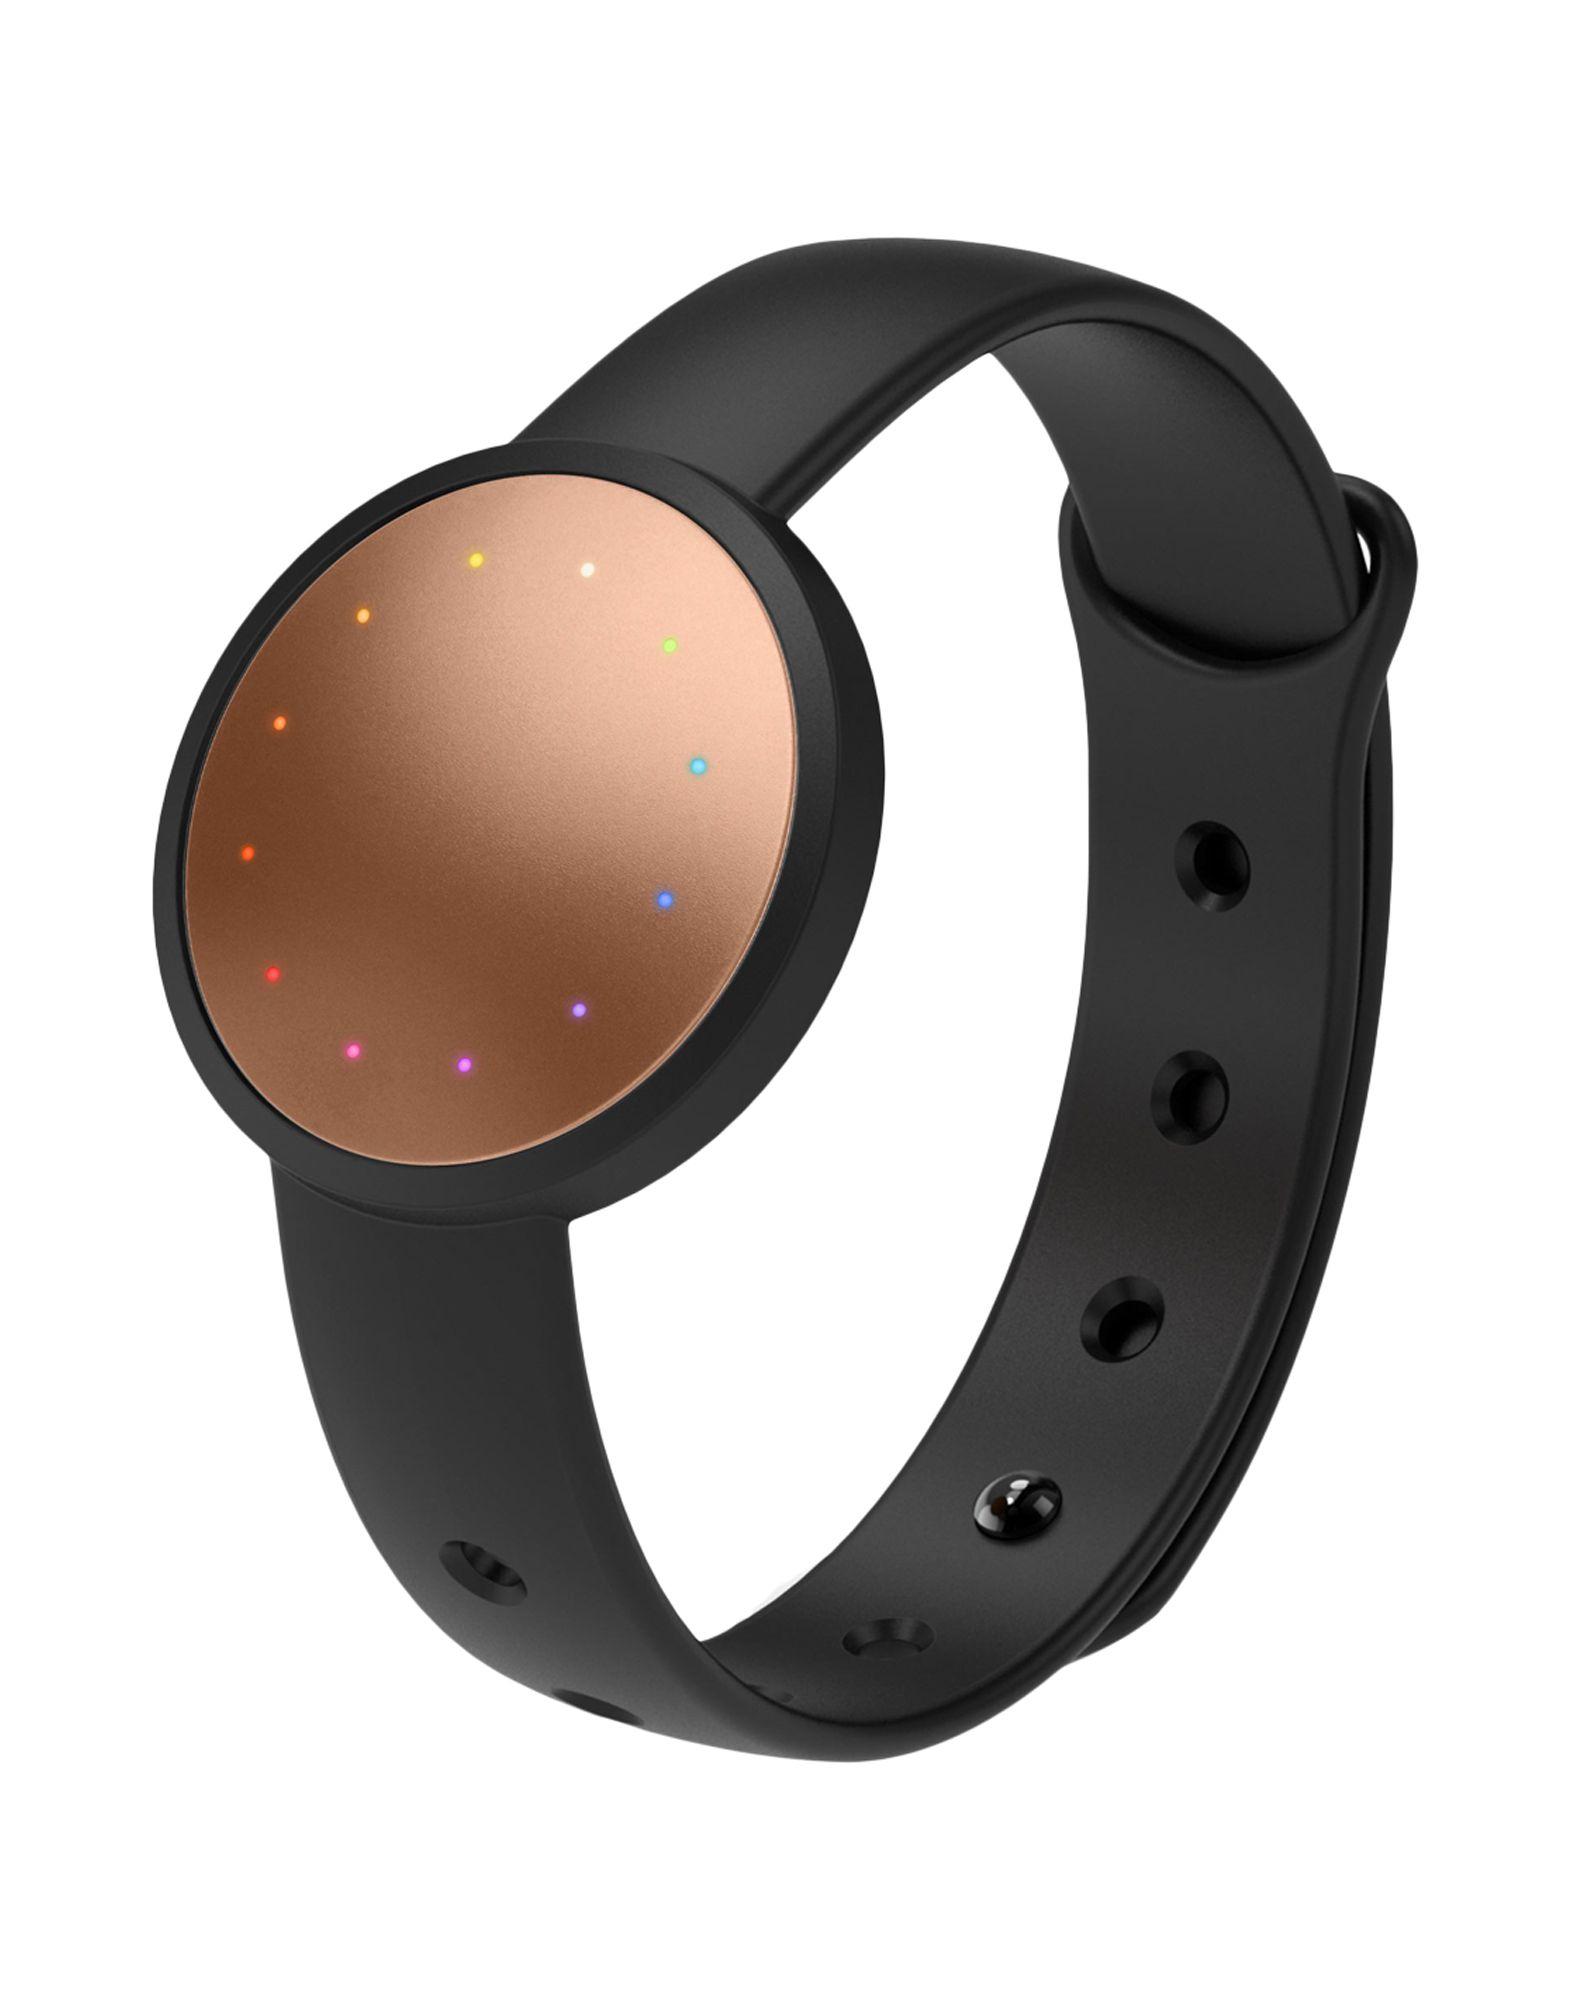 Orologio Da Polso Misfit  Shine 2 Fitness And Sleep Tracker - Uomo - Acquista online su